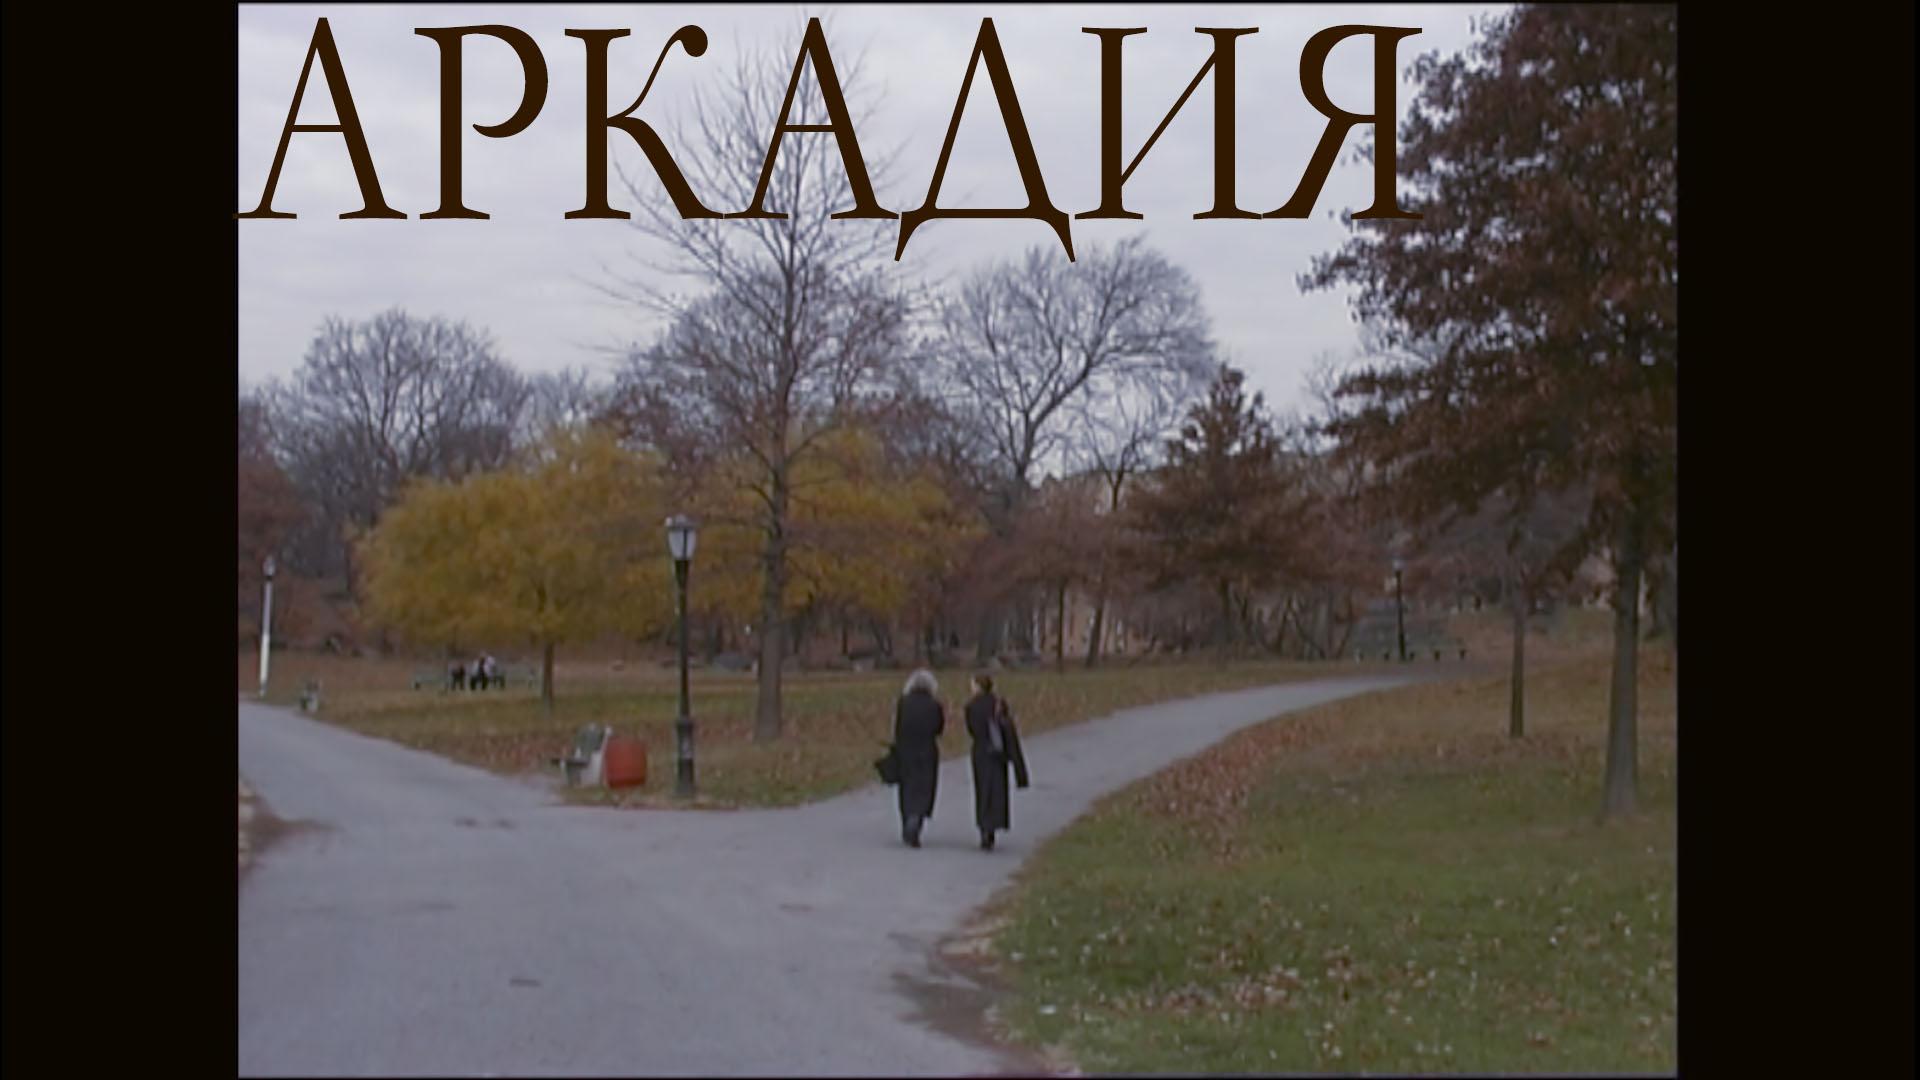 Arcadia_poster_rus copy